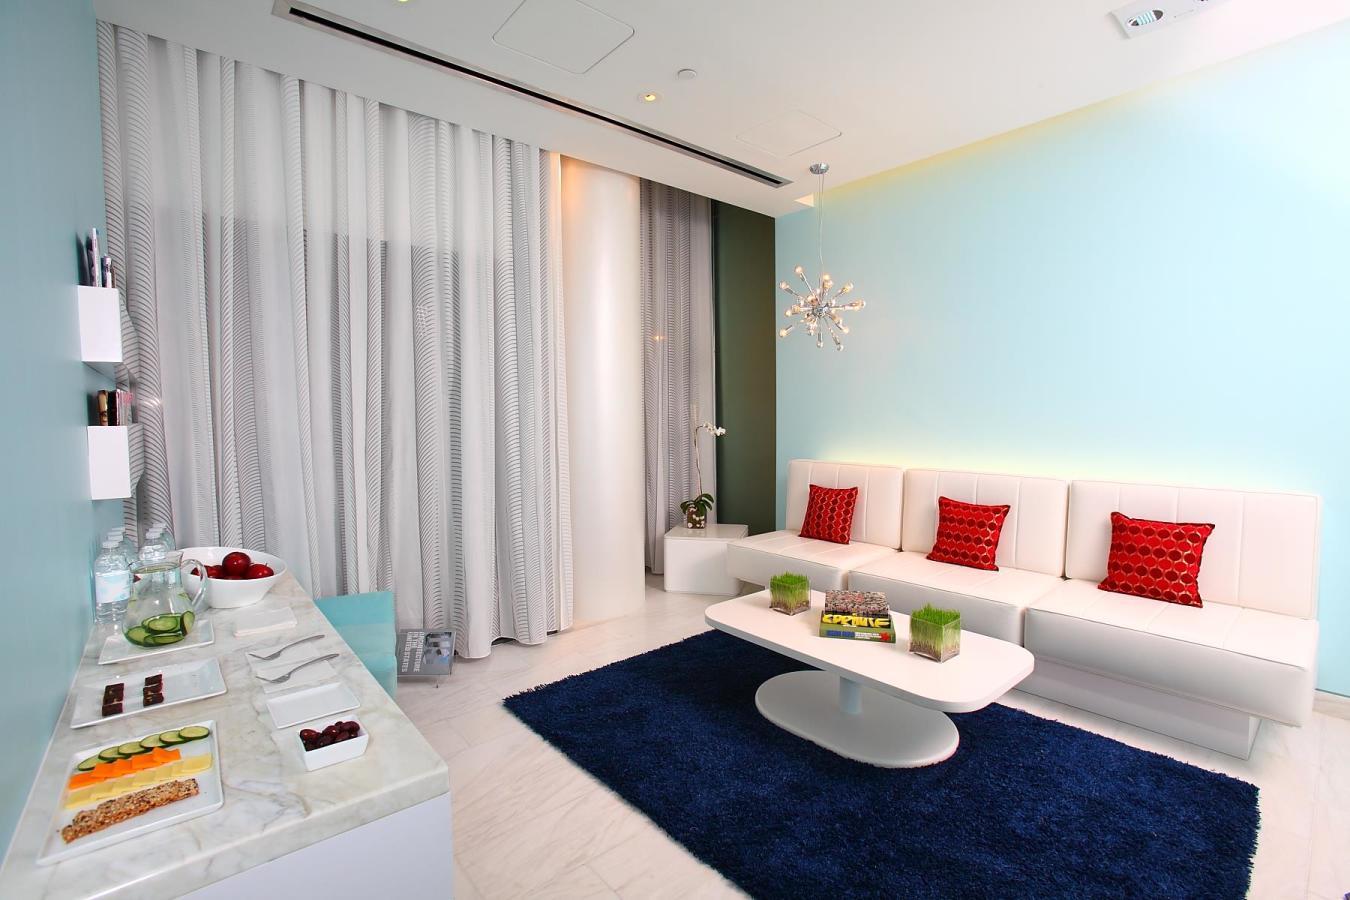 Bliss South Beach men's lounge,